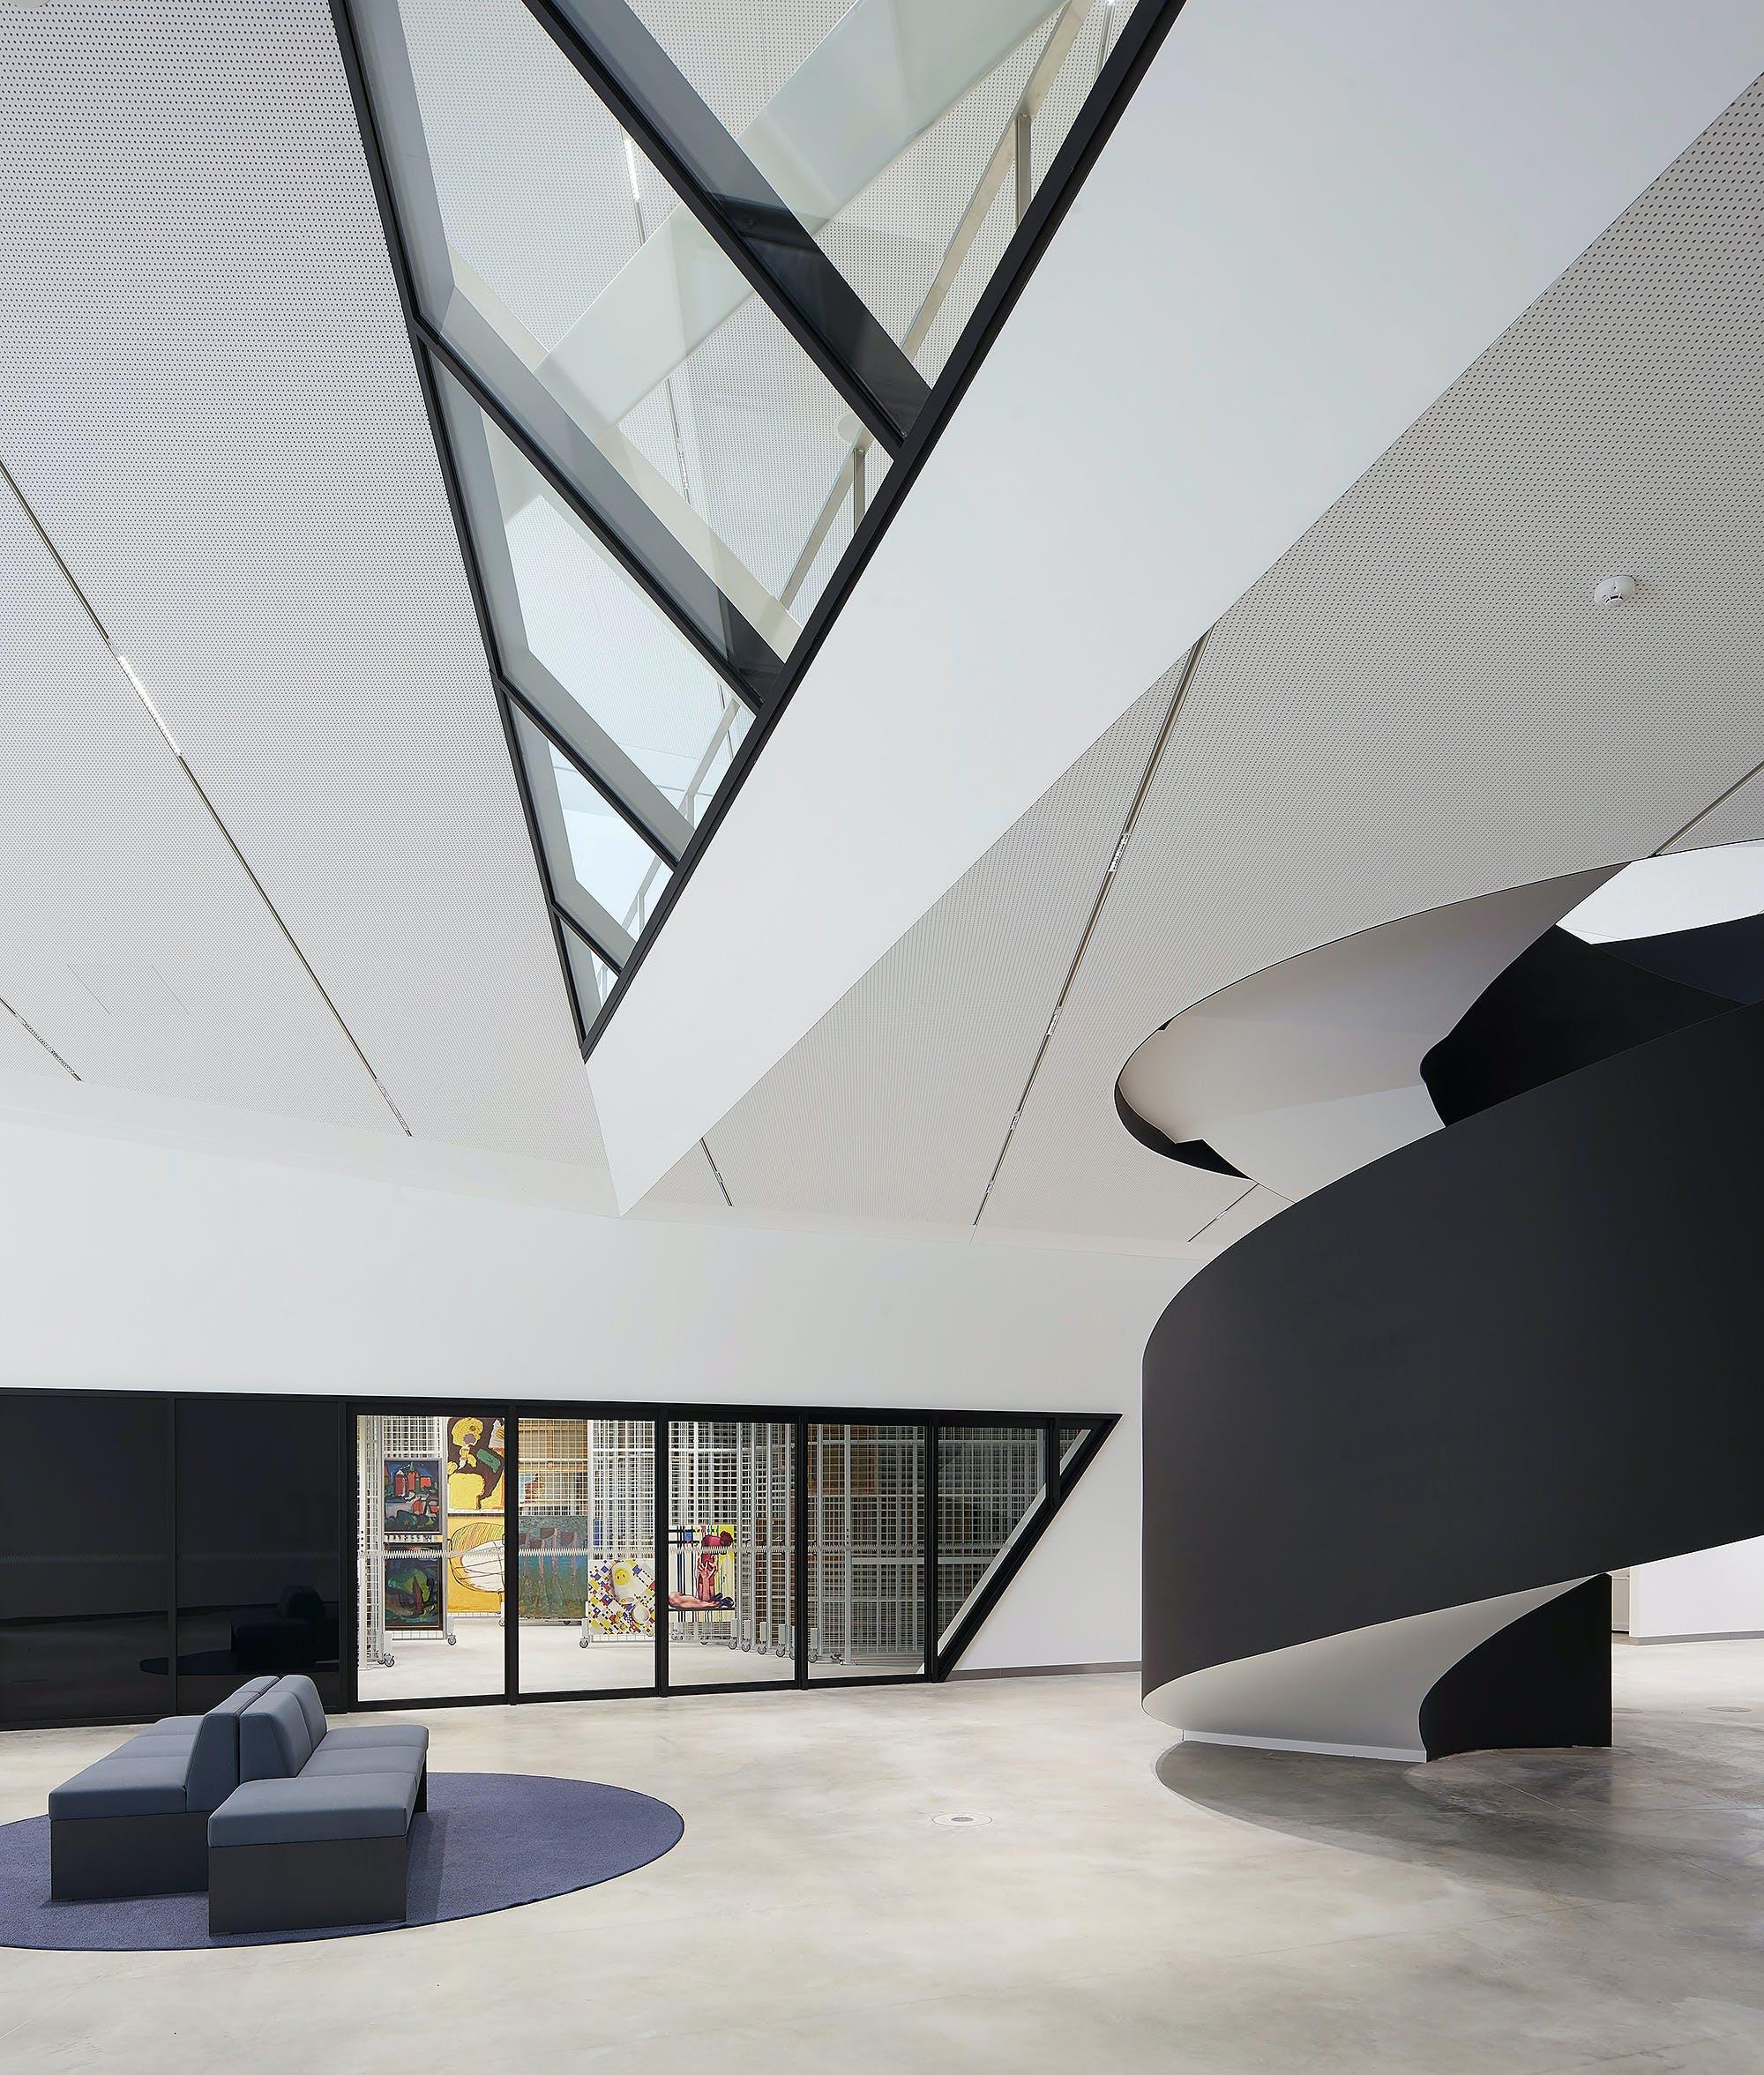 Studio Daniel Libeskind S Mo Modern Art Museum In Vilnius